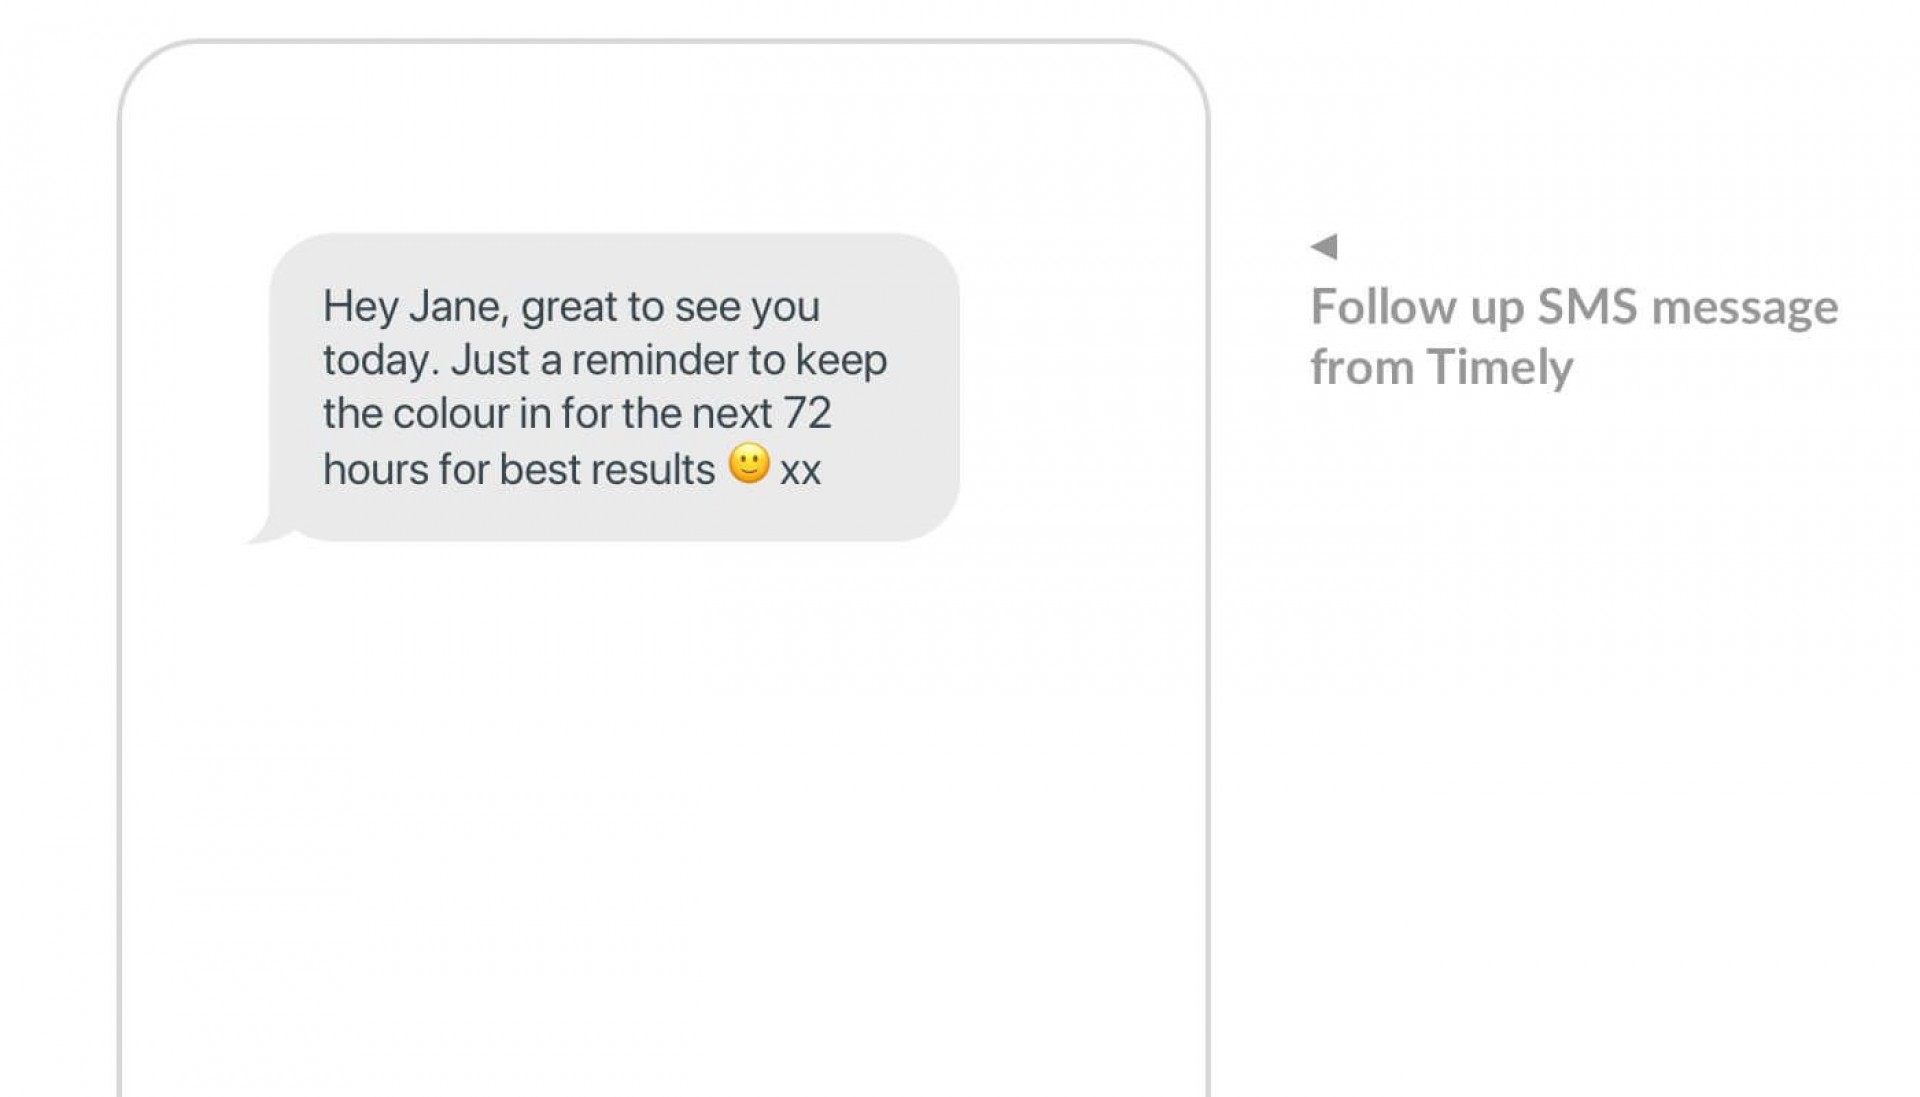 009 Impressive Follow Up Email Template Request Idea 1920